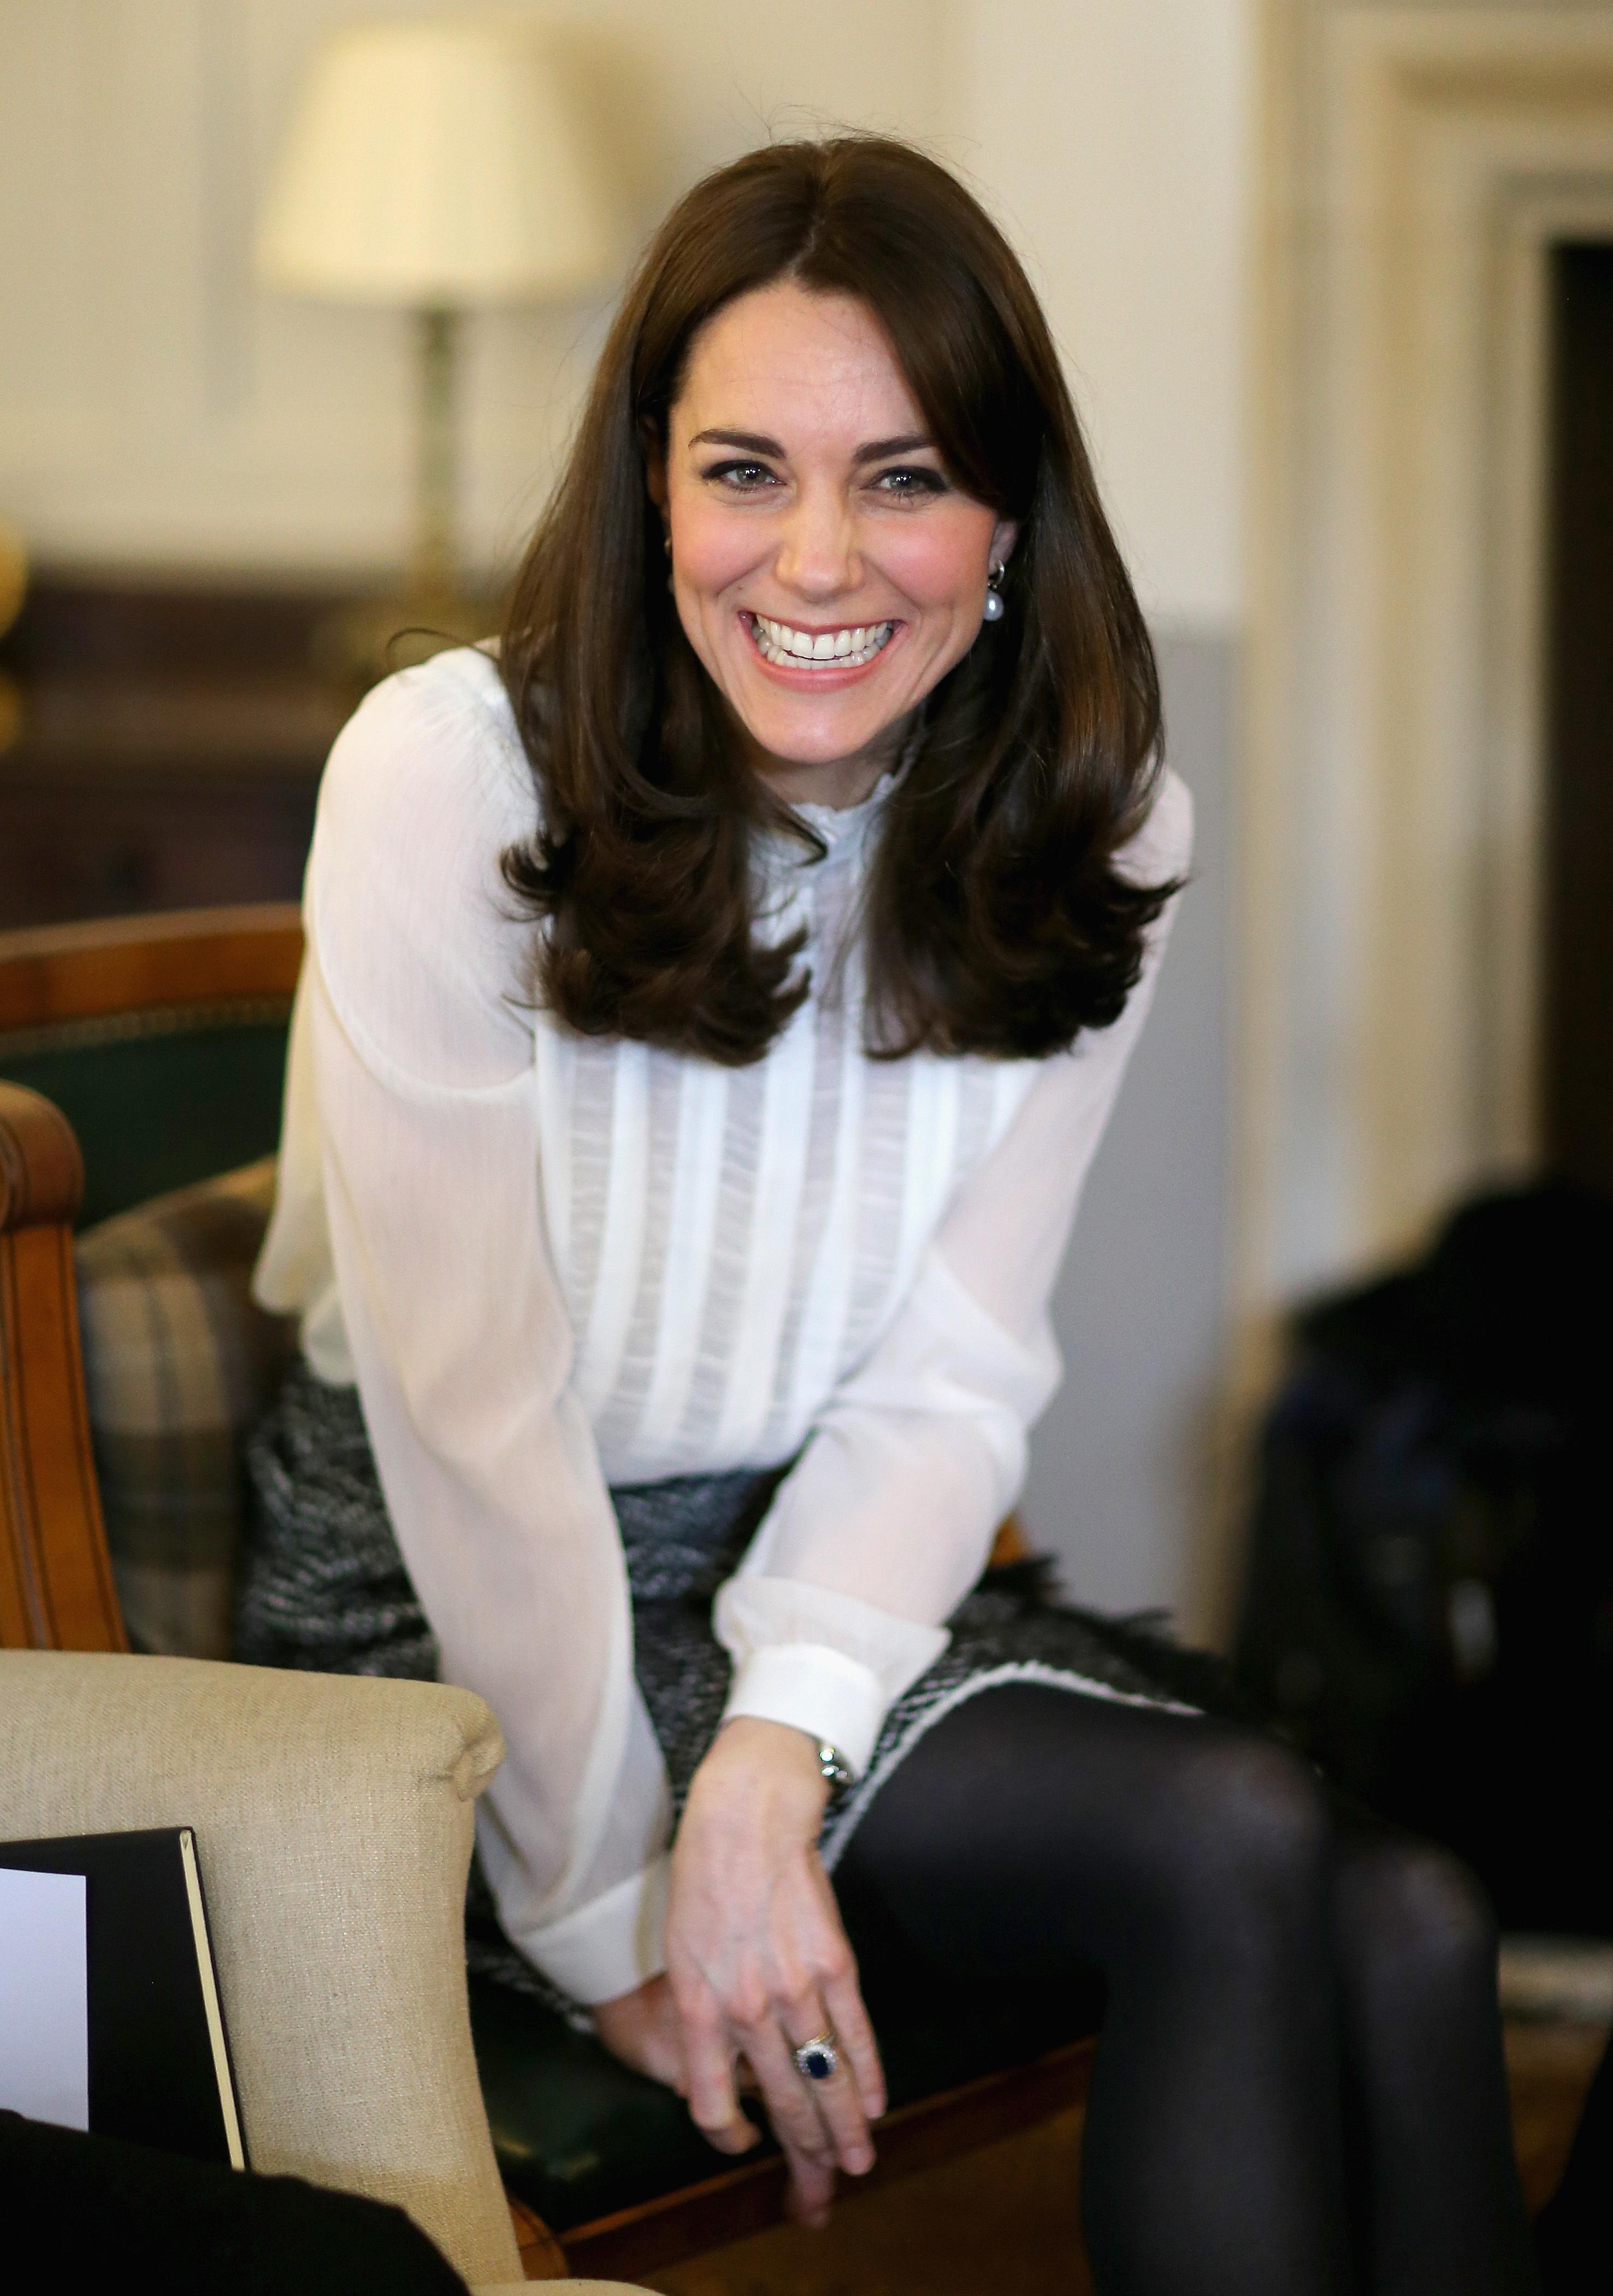 Duchess Kate edits the Huffington Post